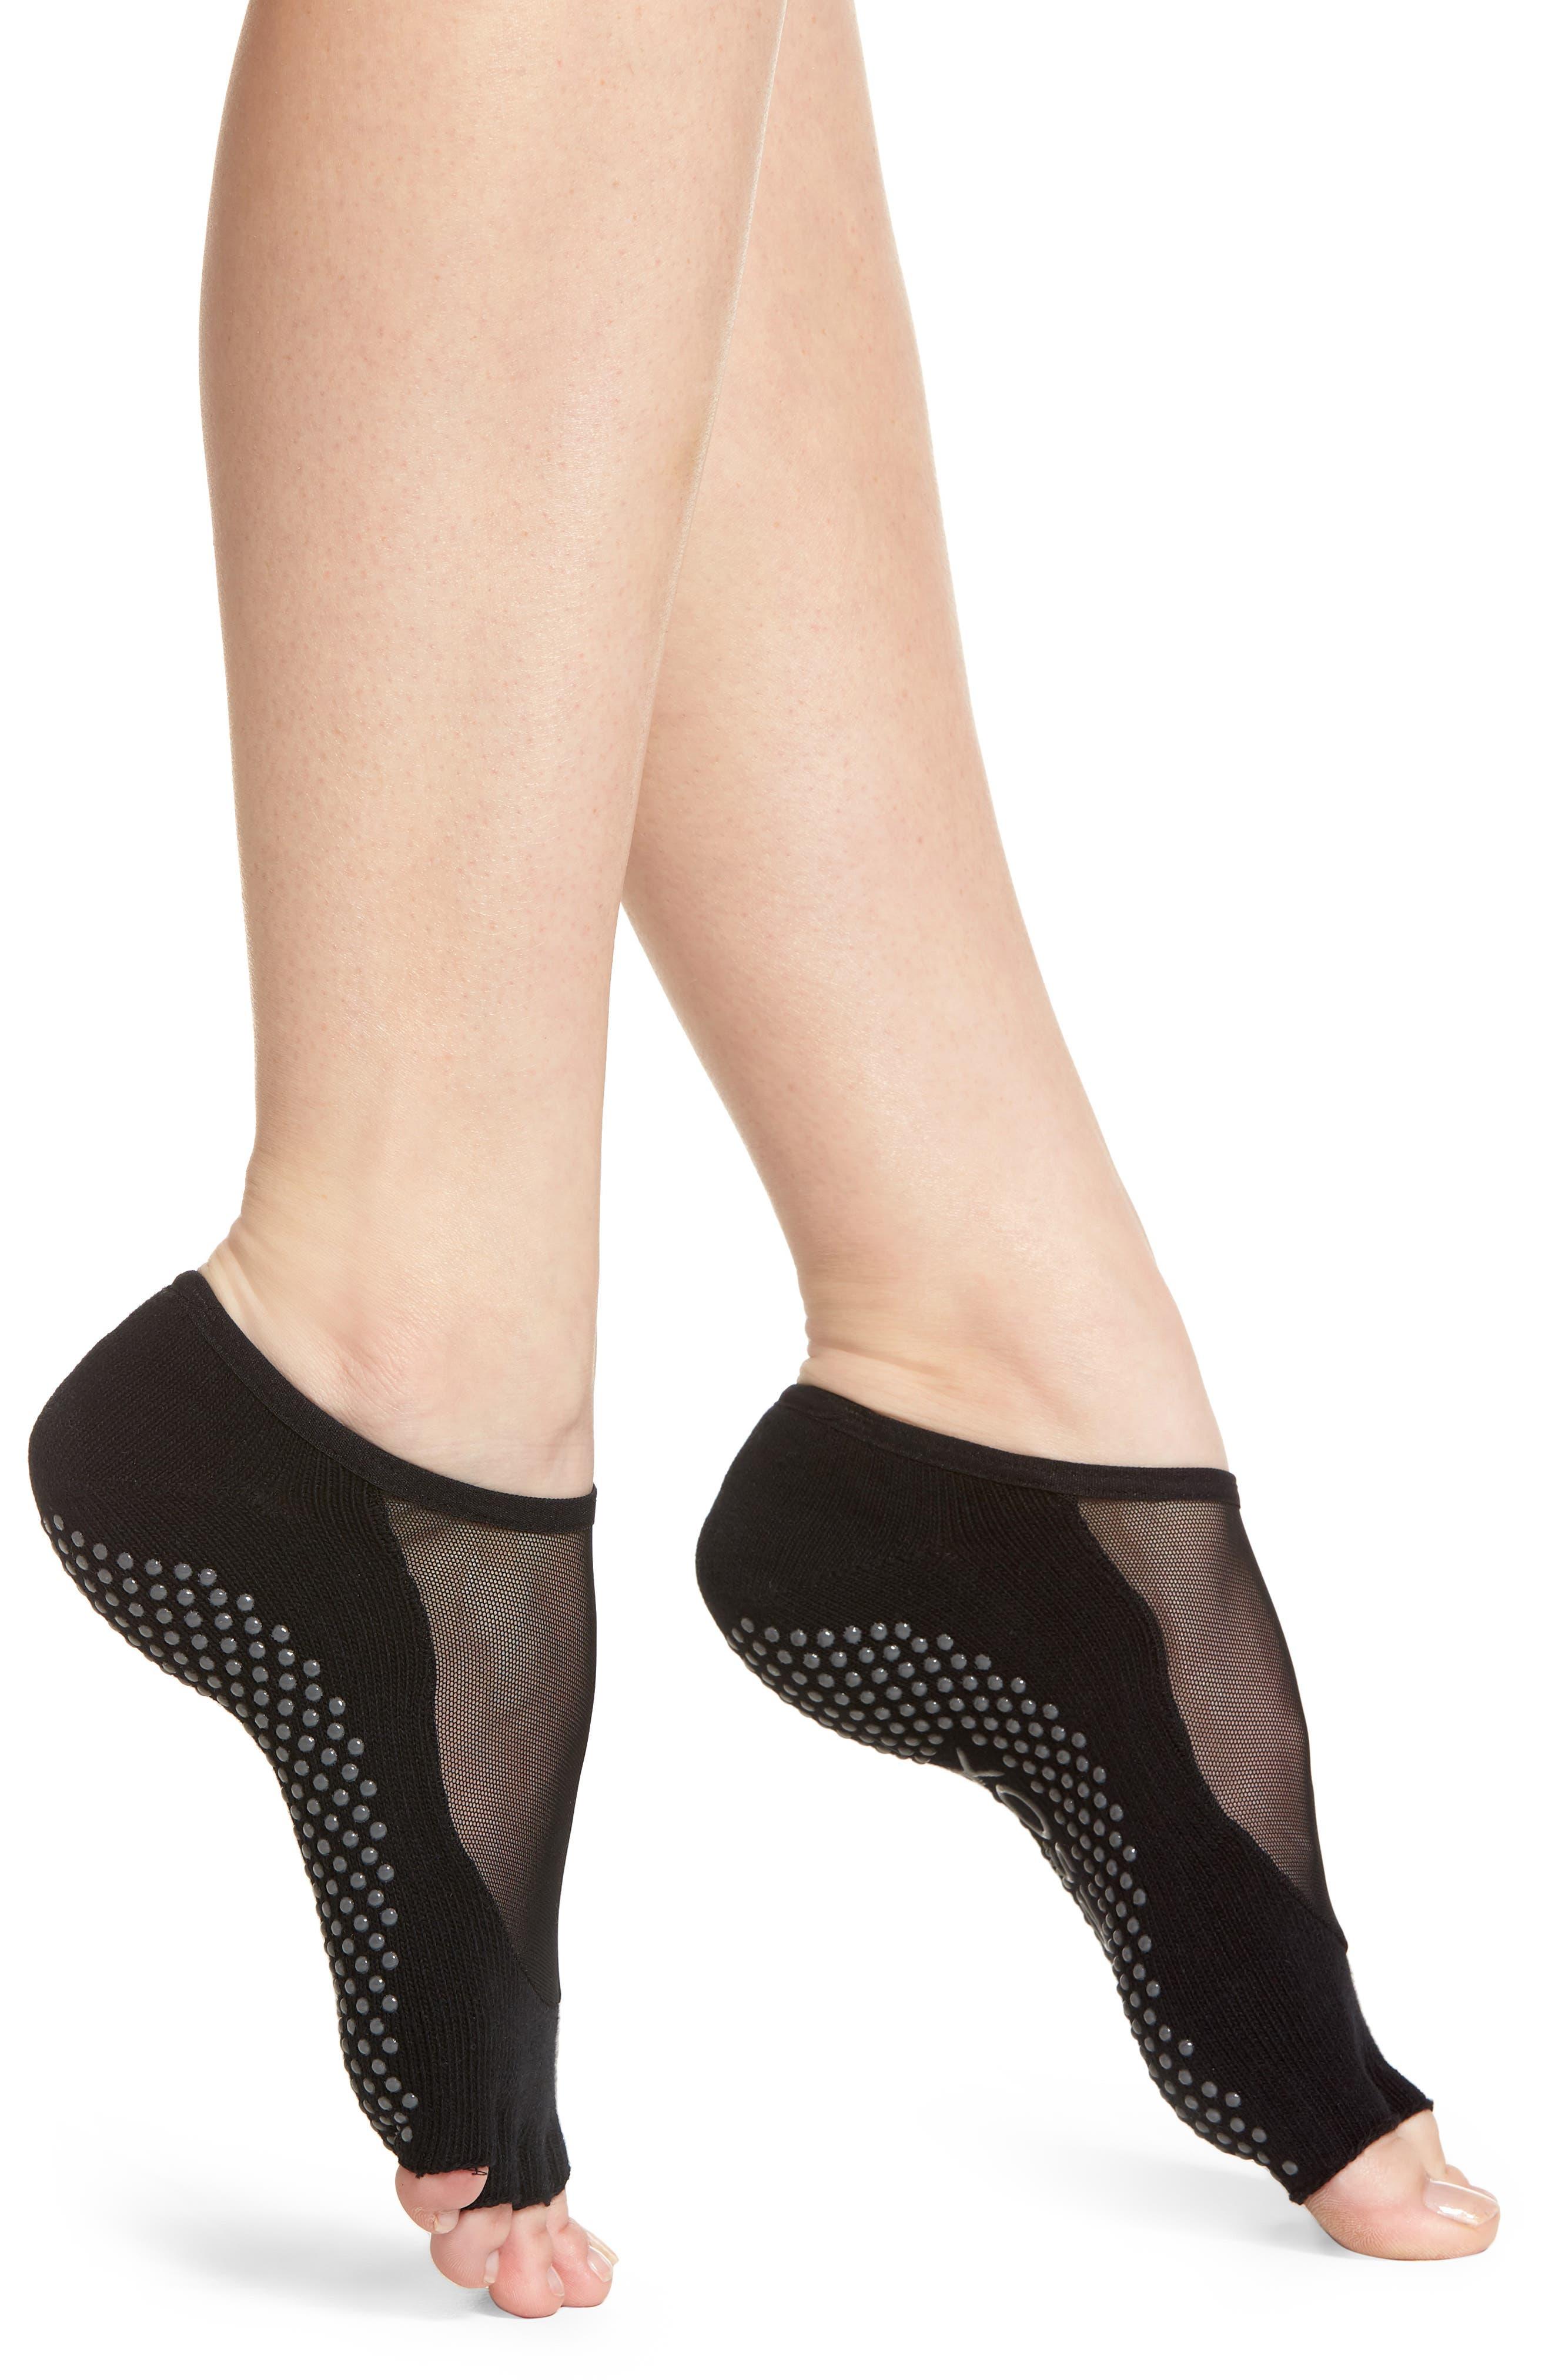 Luna Half Toe Gripper Socks,                         Main,                         color, BLACK